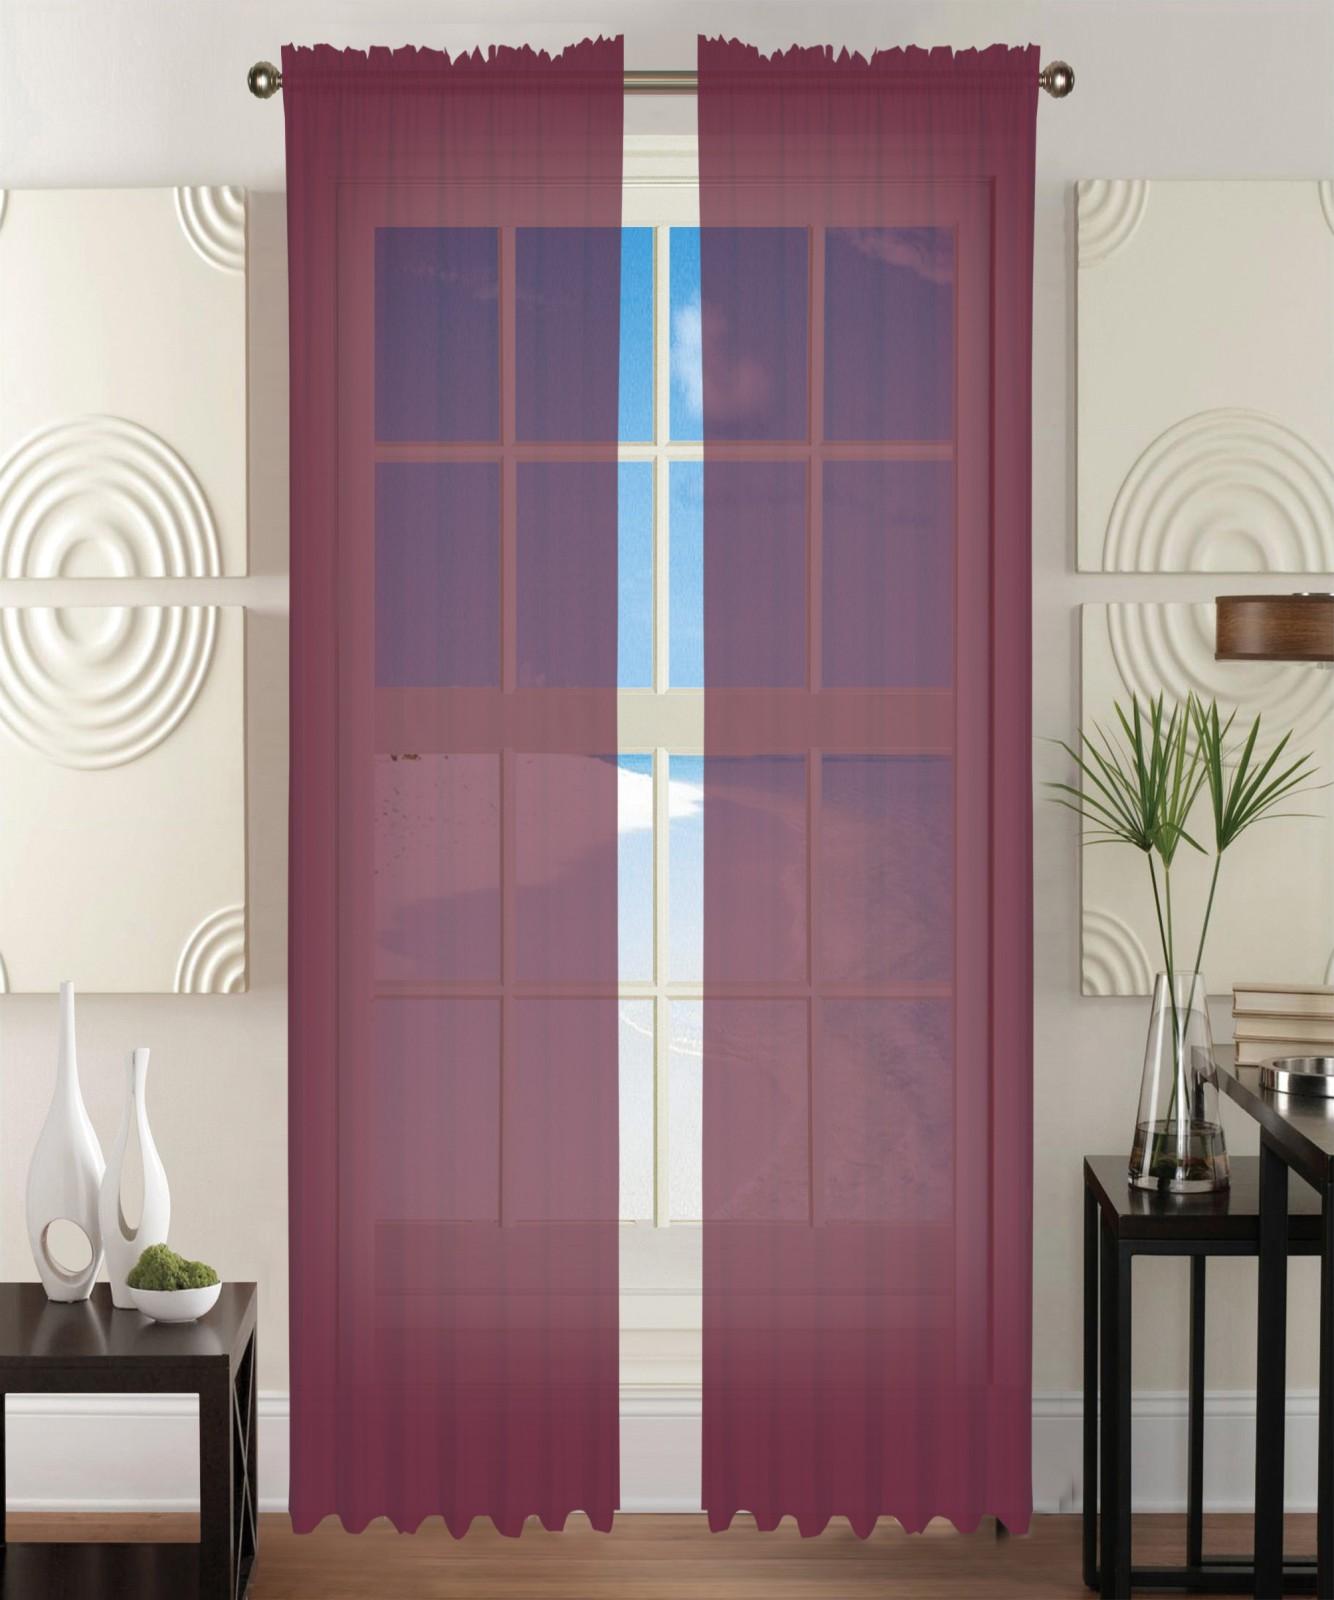 2 Piece Solid Burgundy Sheer Window Curtains/drape